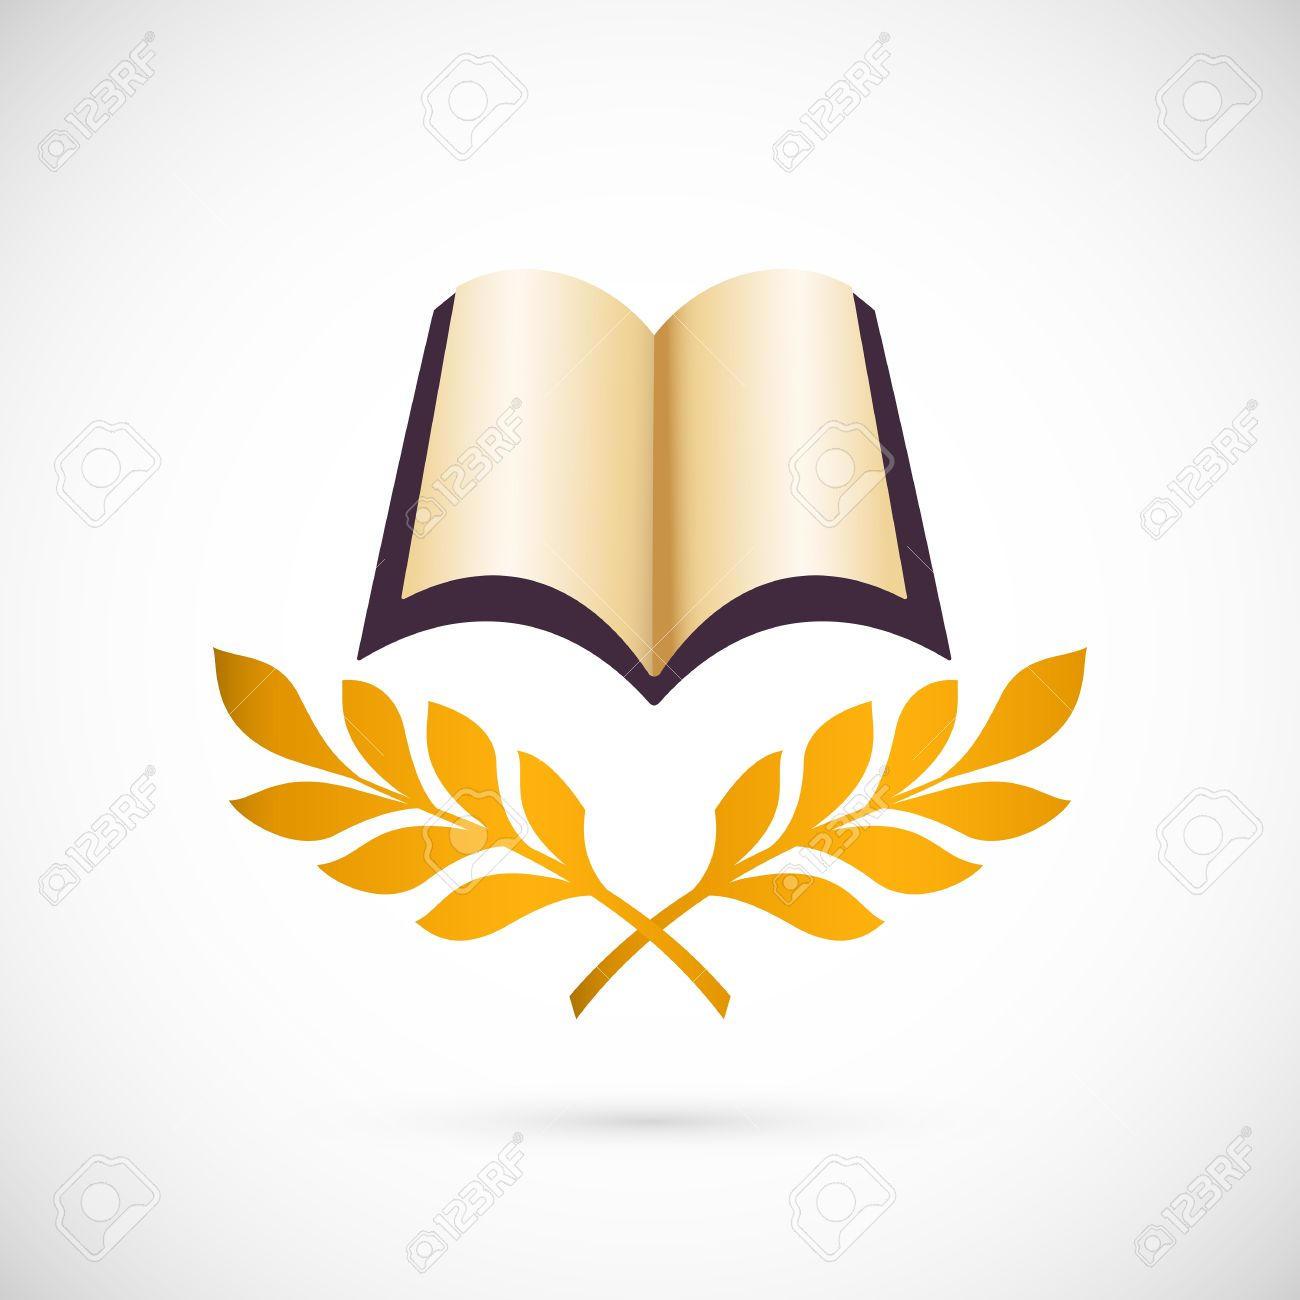 Open Book Icon. Education Creative Symbol Design Royalty Free.